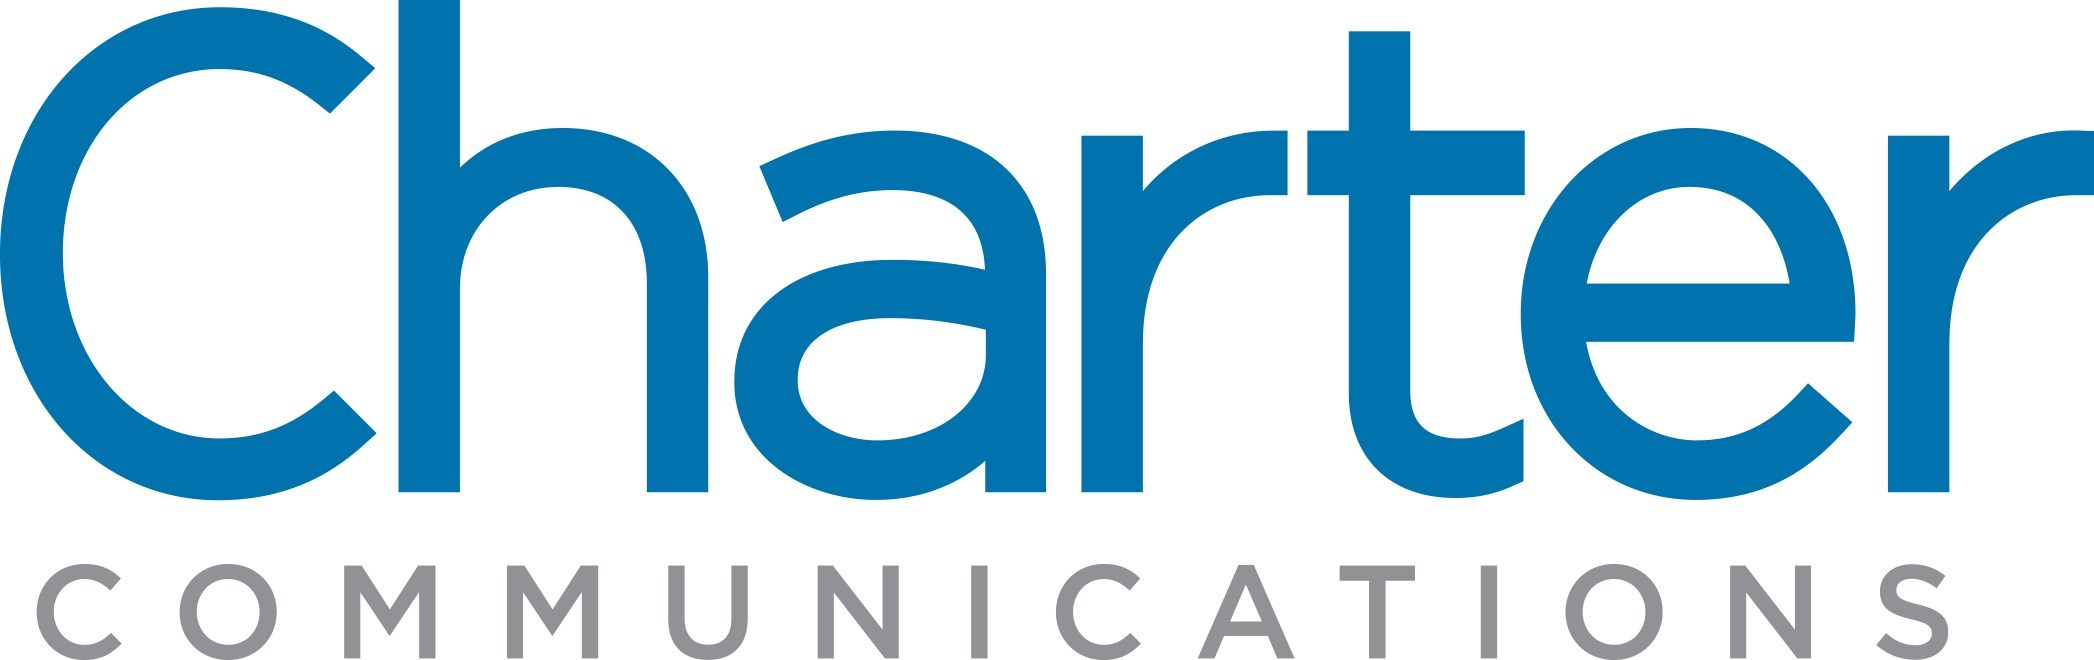 Charter Promotes Jodi Robinson To EVP, Digital Platforms And Jake Perlman To EVP, Software Development & IT